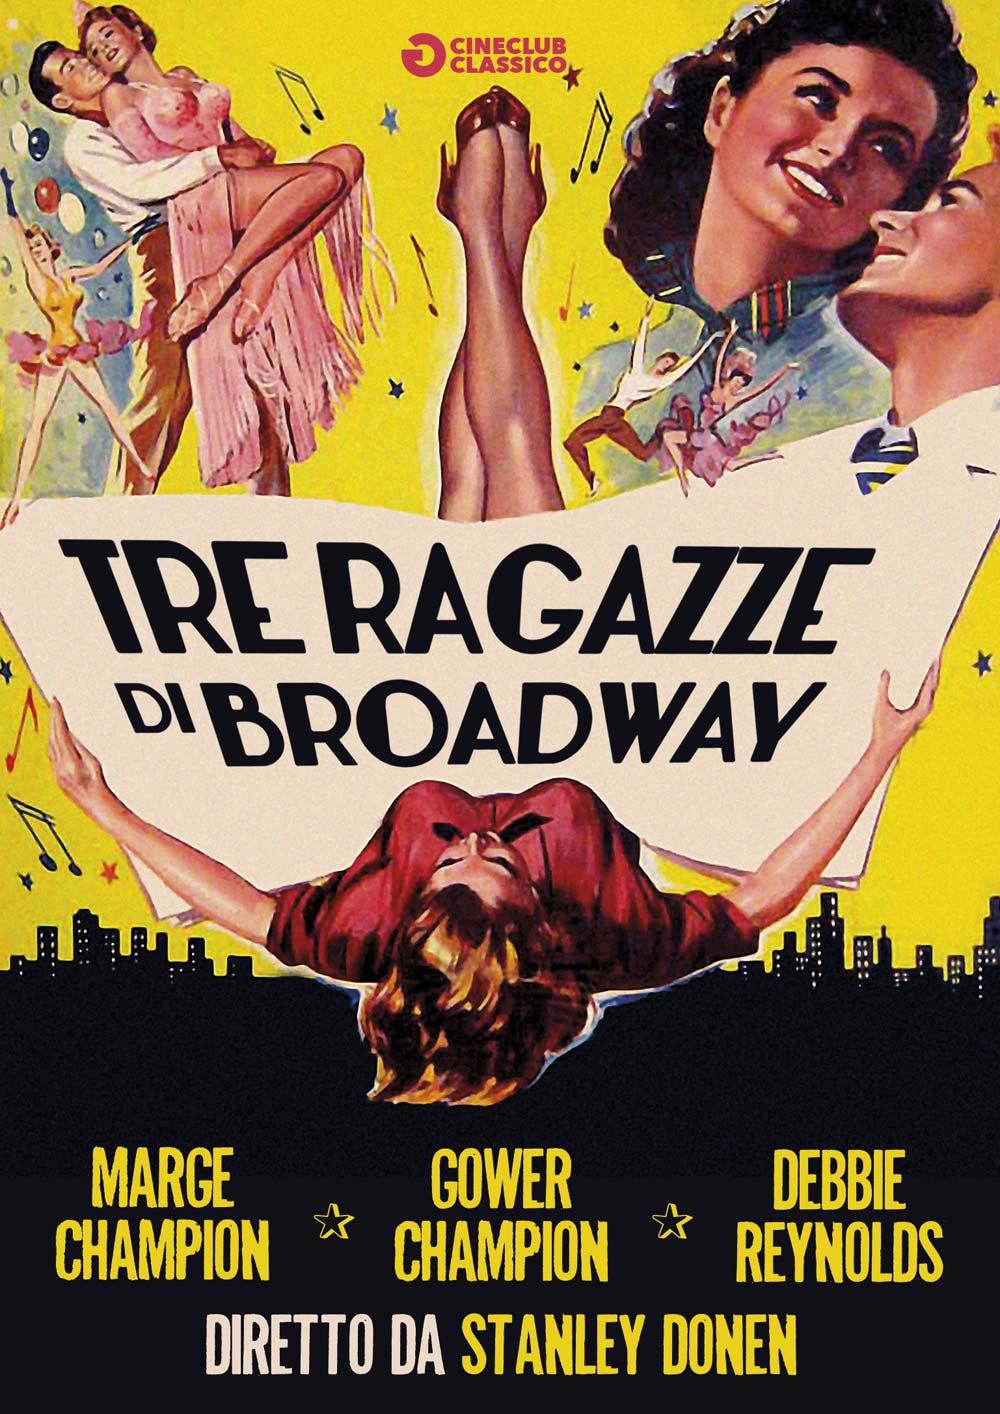 TRE RAGAZZE DI BROADWAY (DVD)